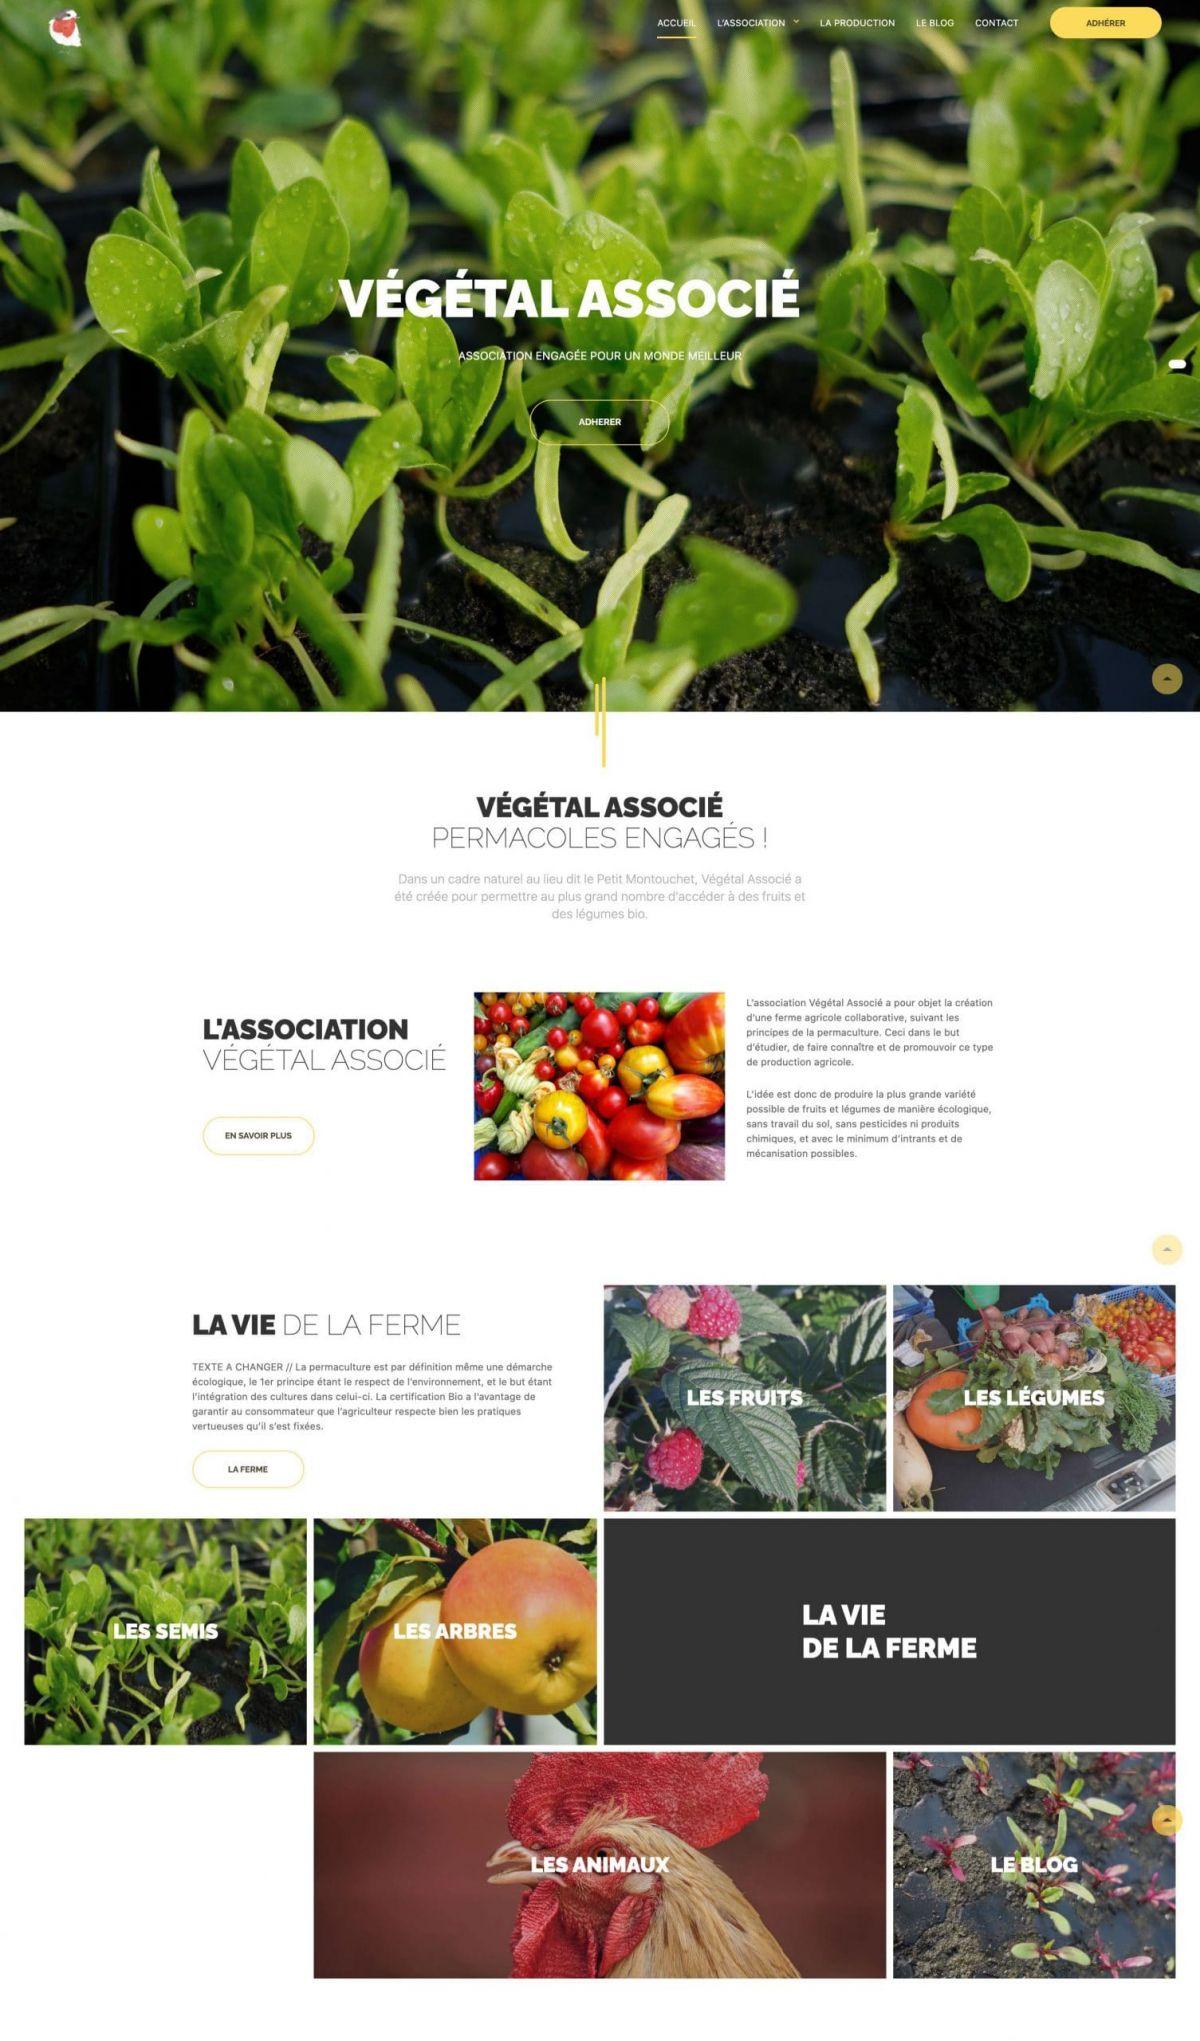 vegetalassocie-associationpermacole